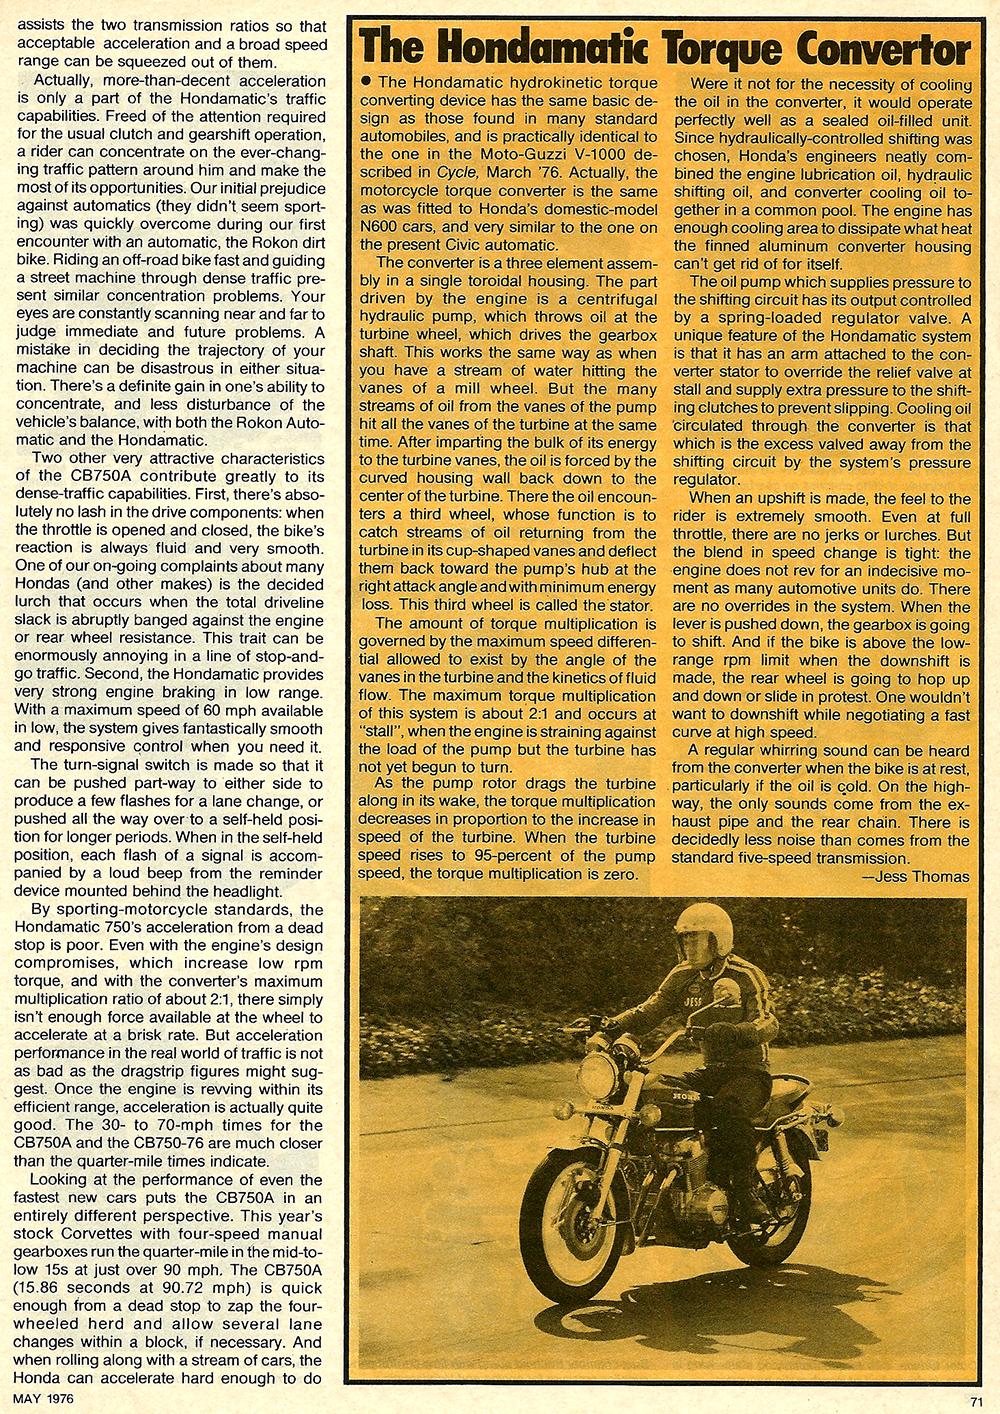 1976 Honda CB750A road test 6.JPG